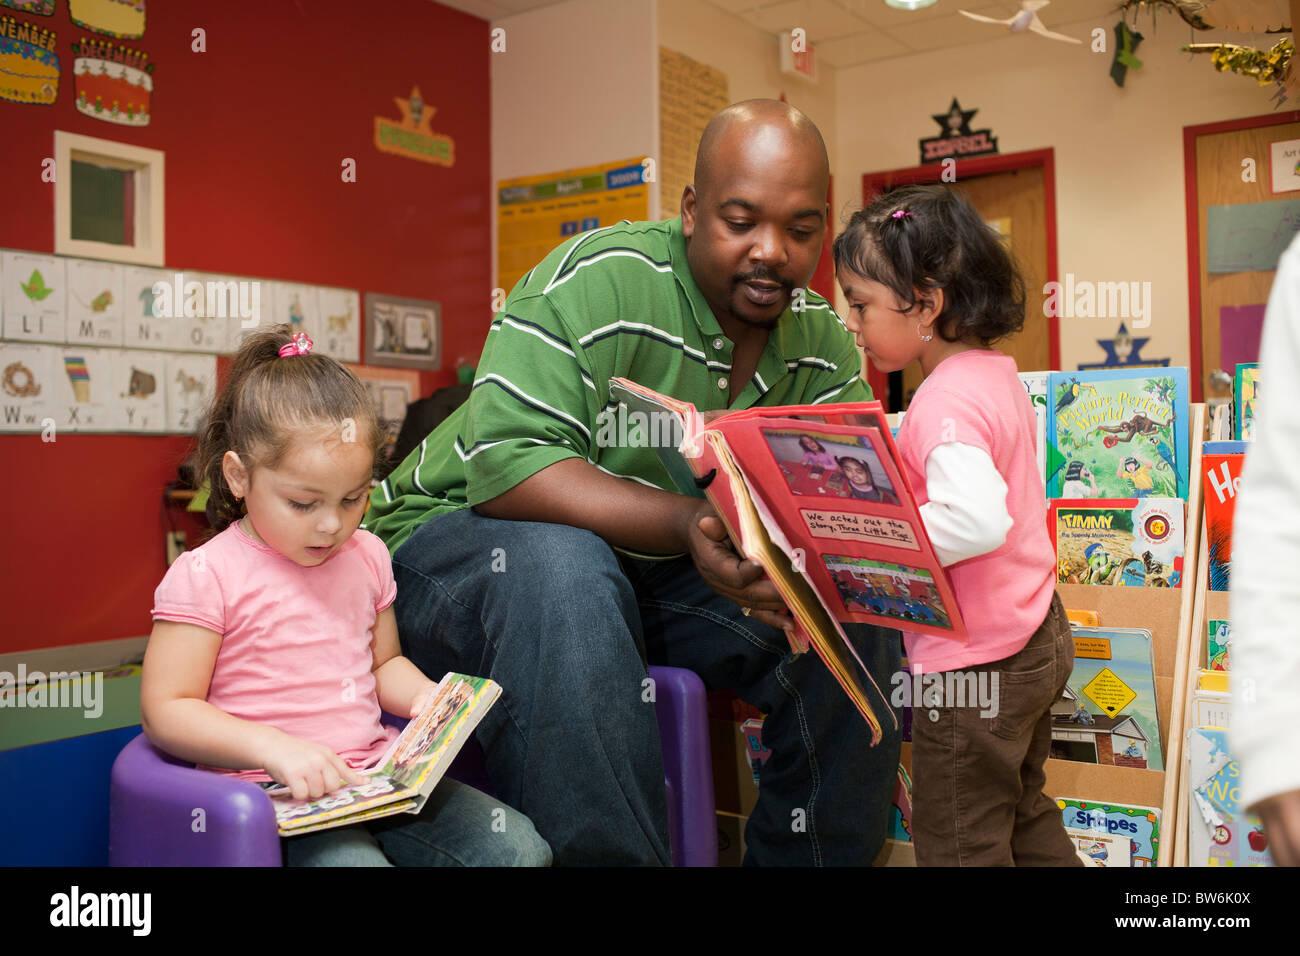 Male African American Preschool Teacher Helping A Girl